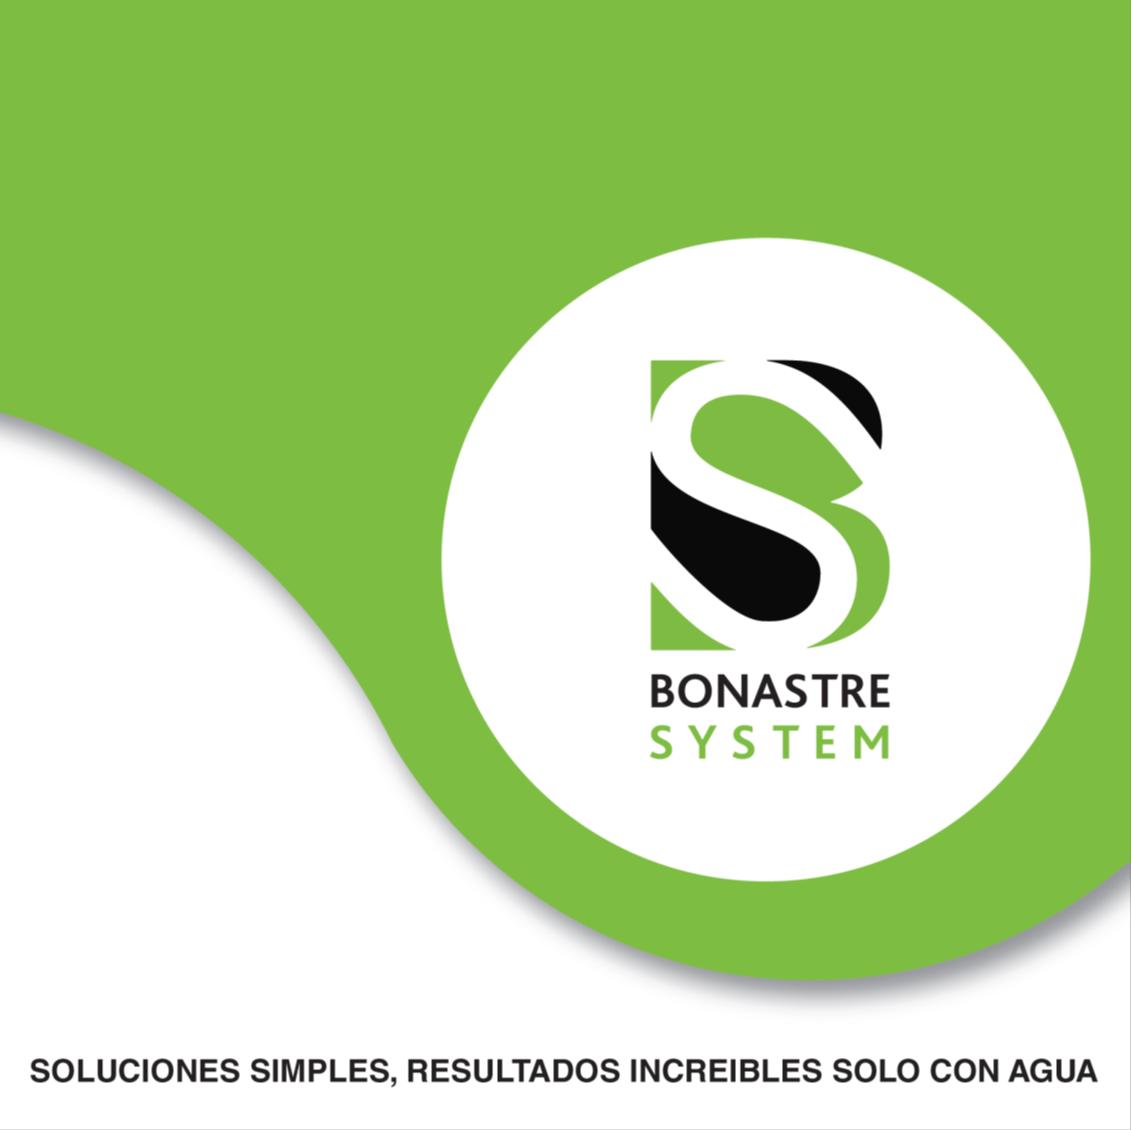 Bonastre System